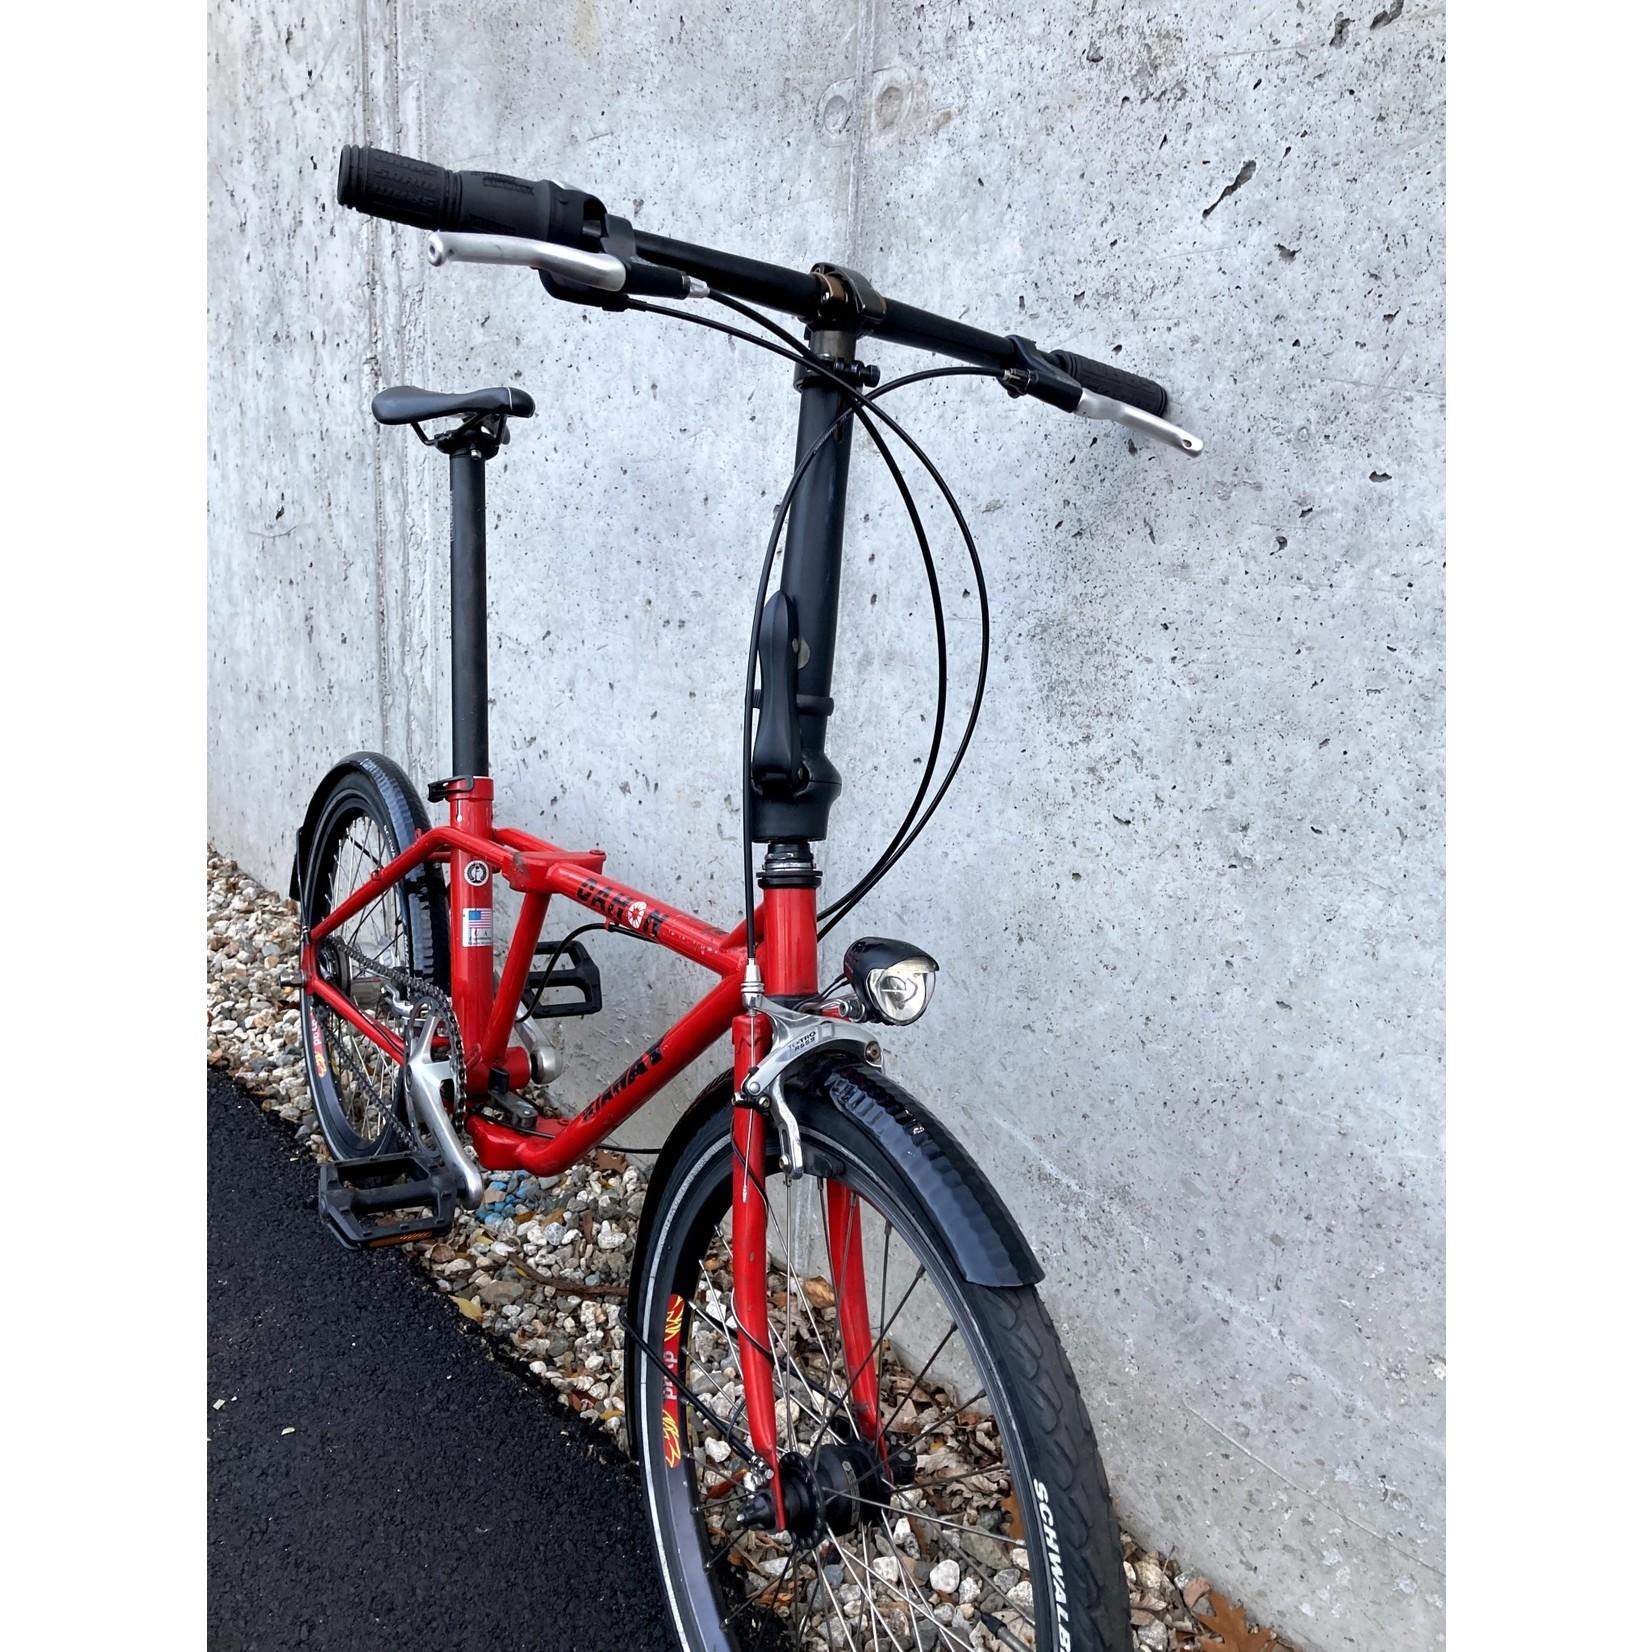 Portland Gear Hub Dahon Getaway Folding Bike - 20366 - Red - 20in Wheel